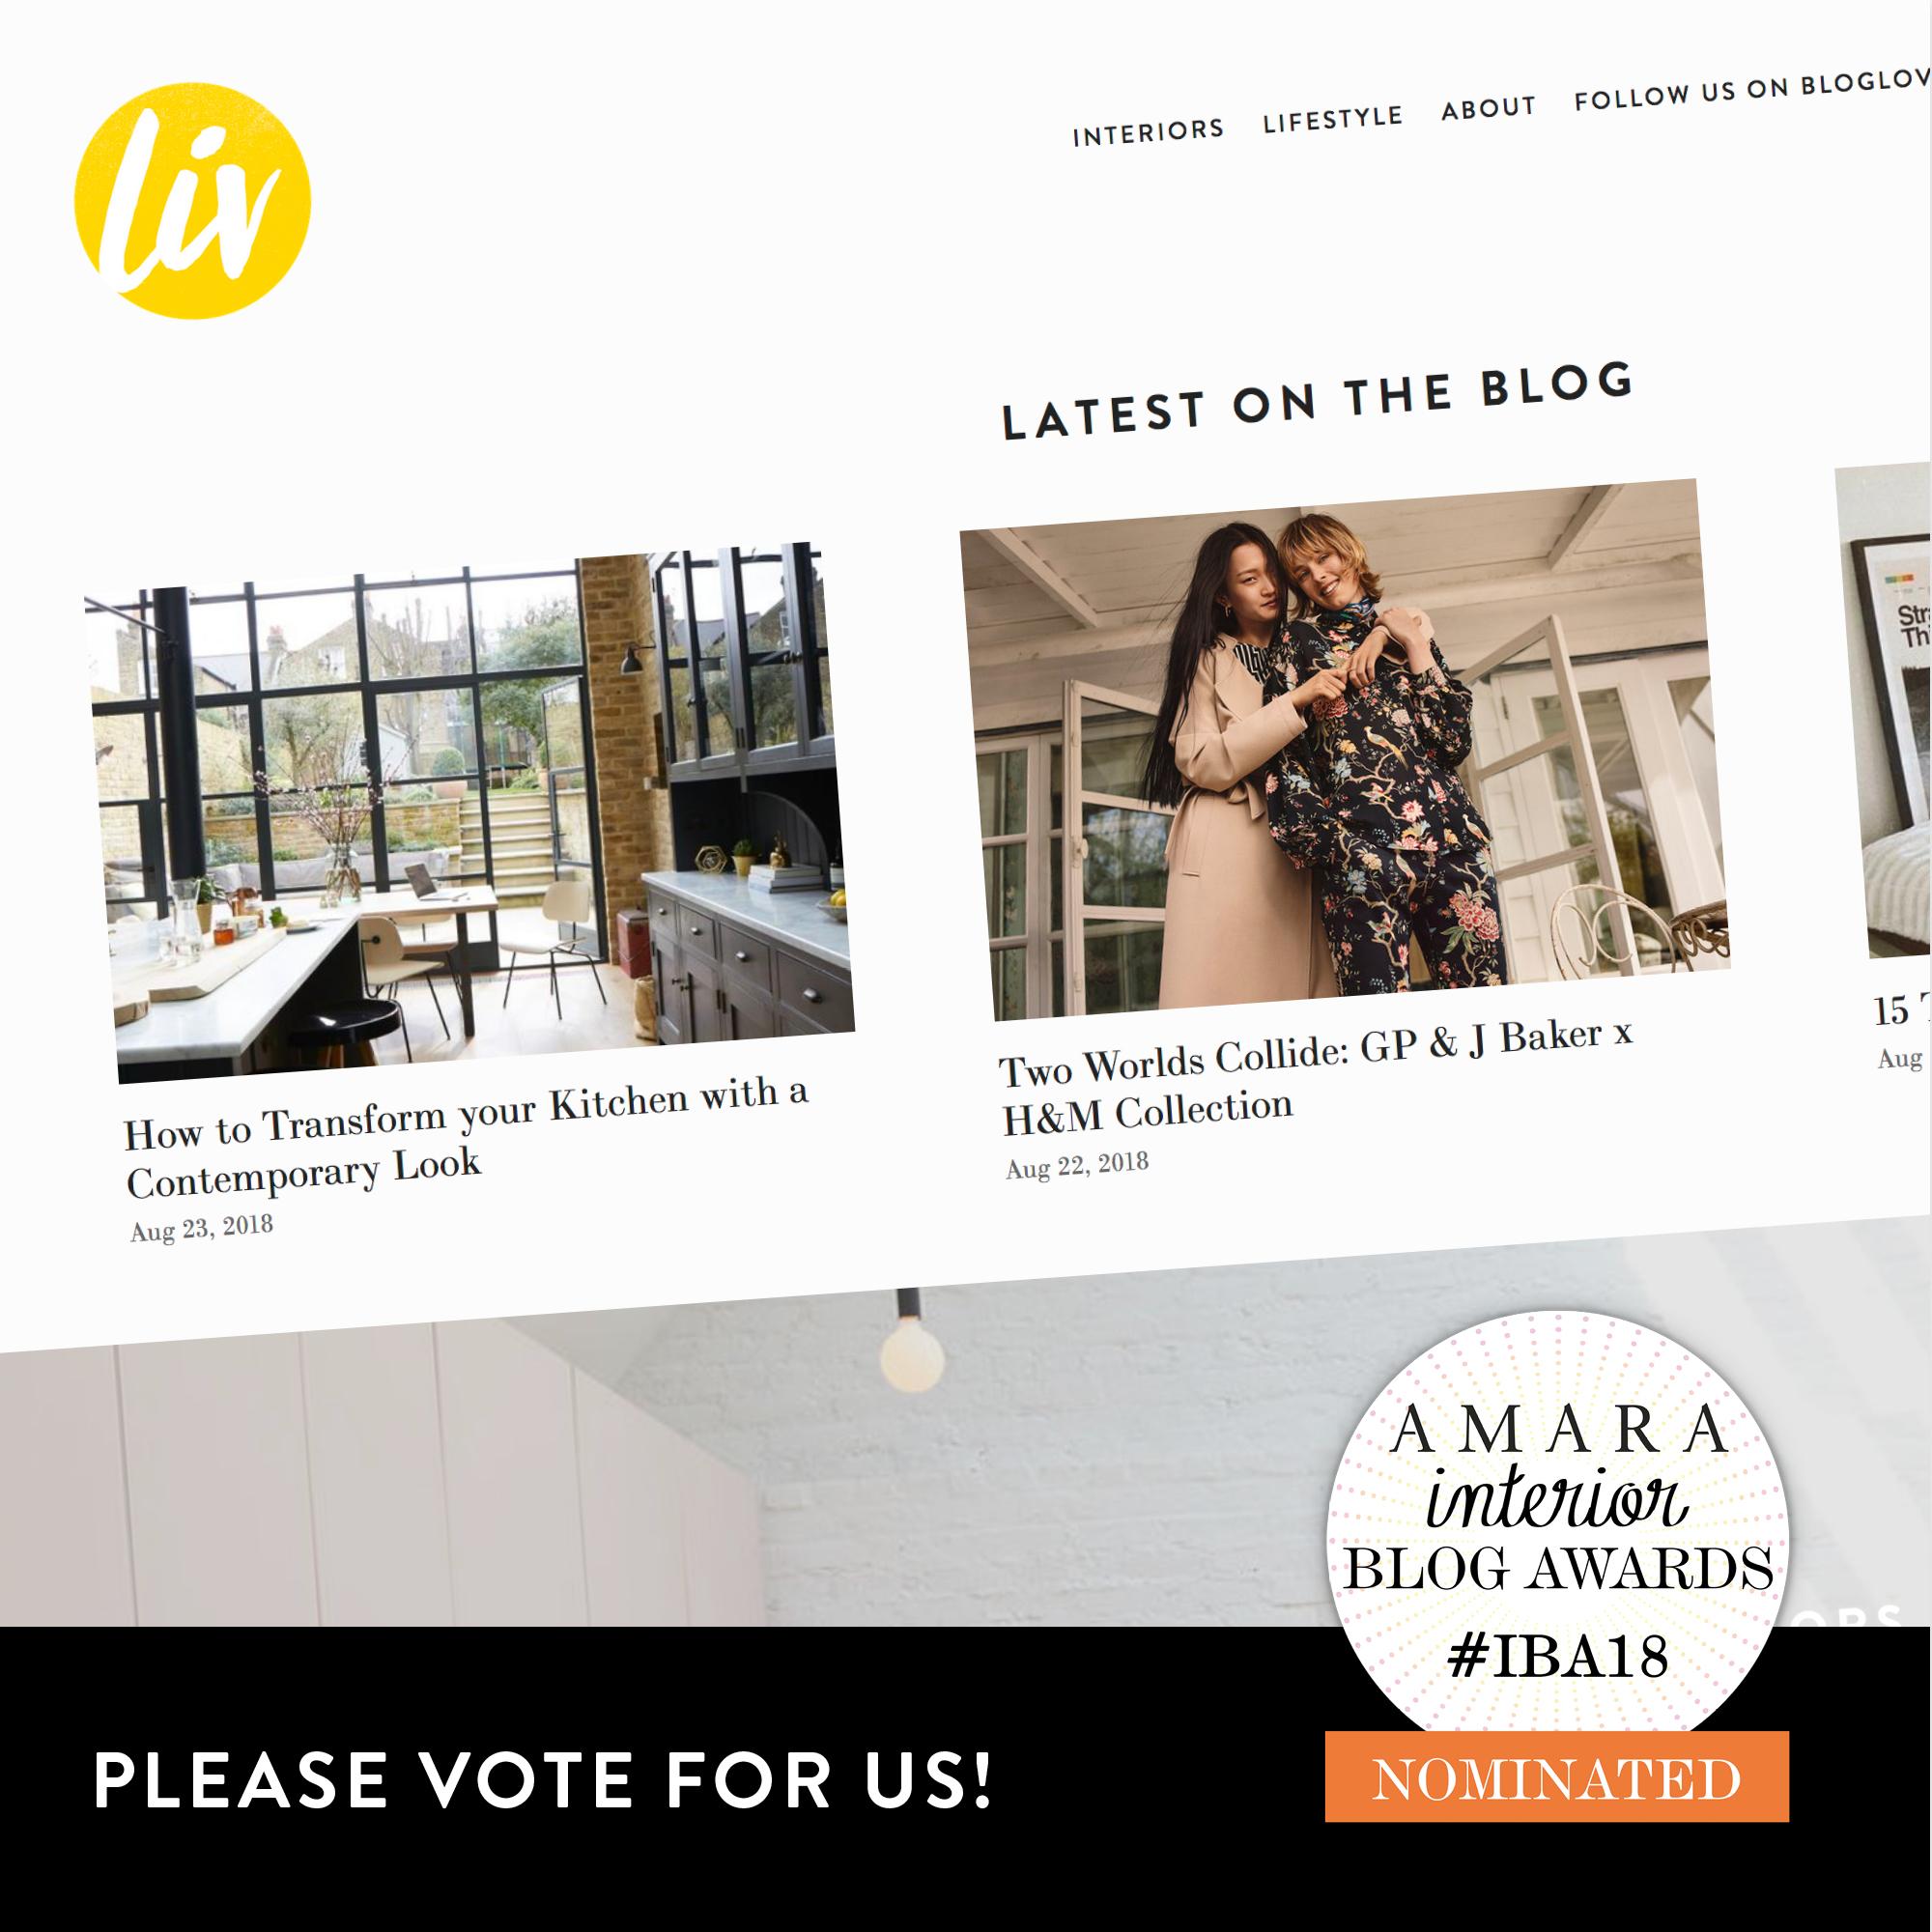 LIV Amara Nominated.jpg